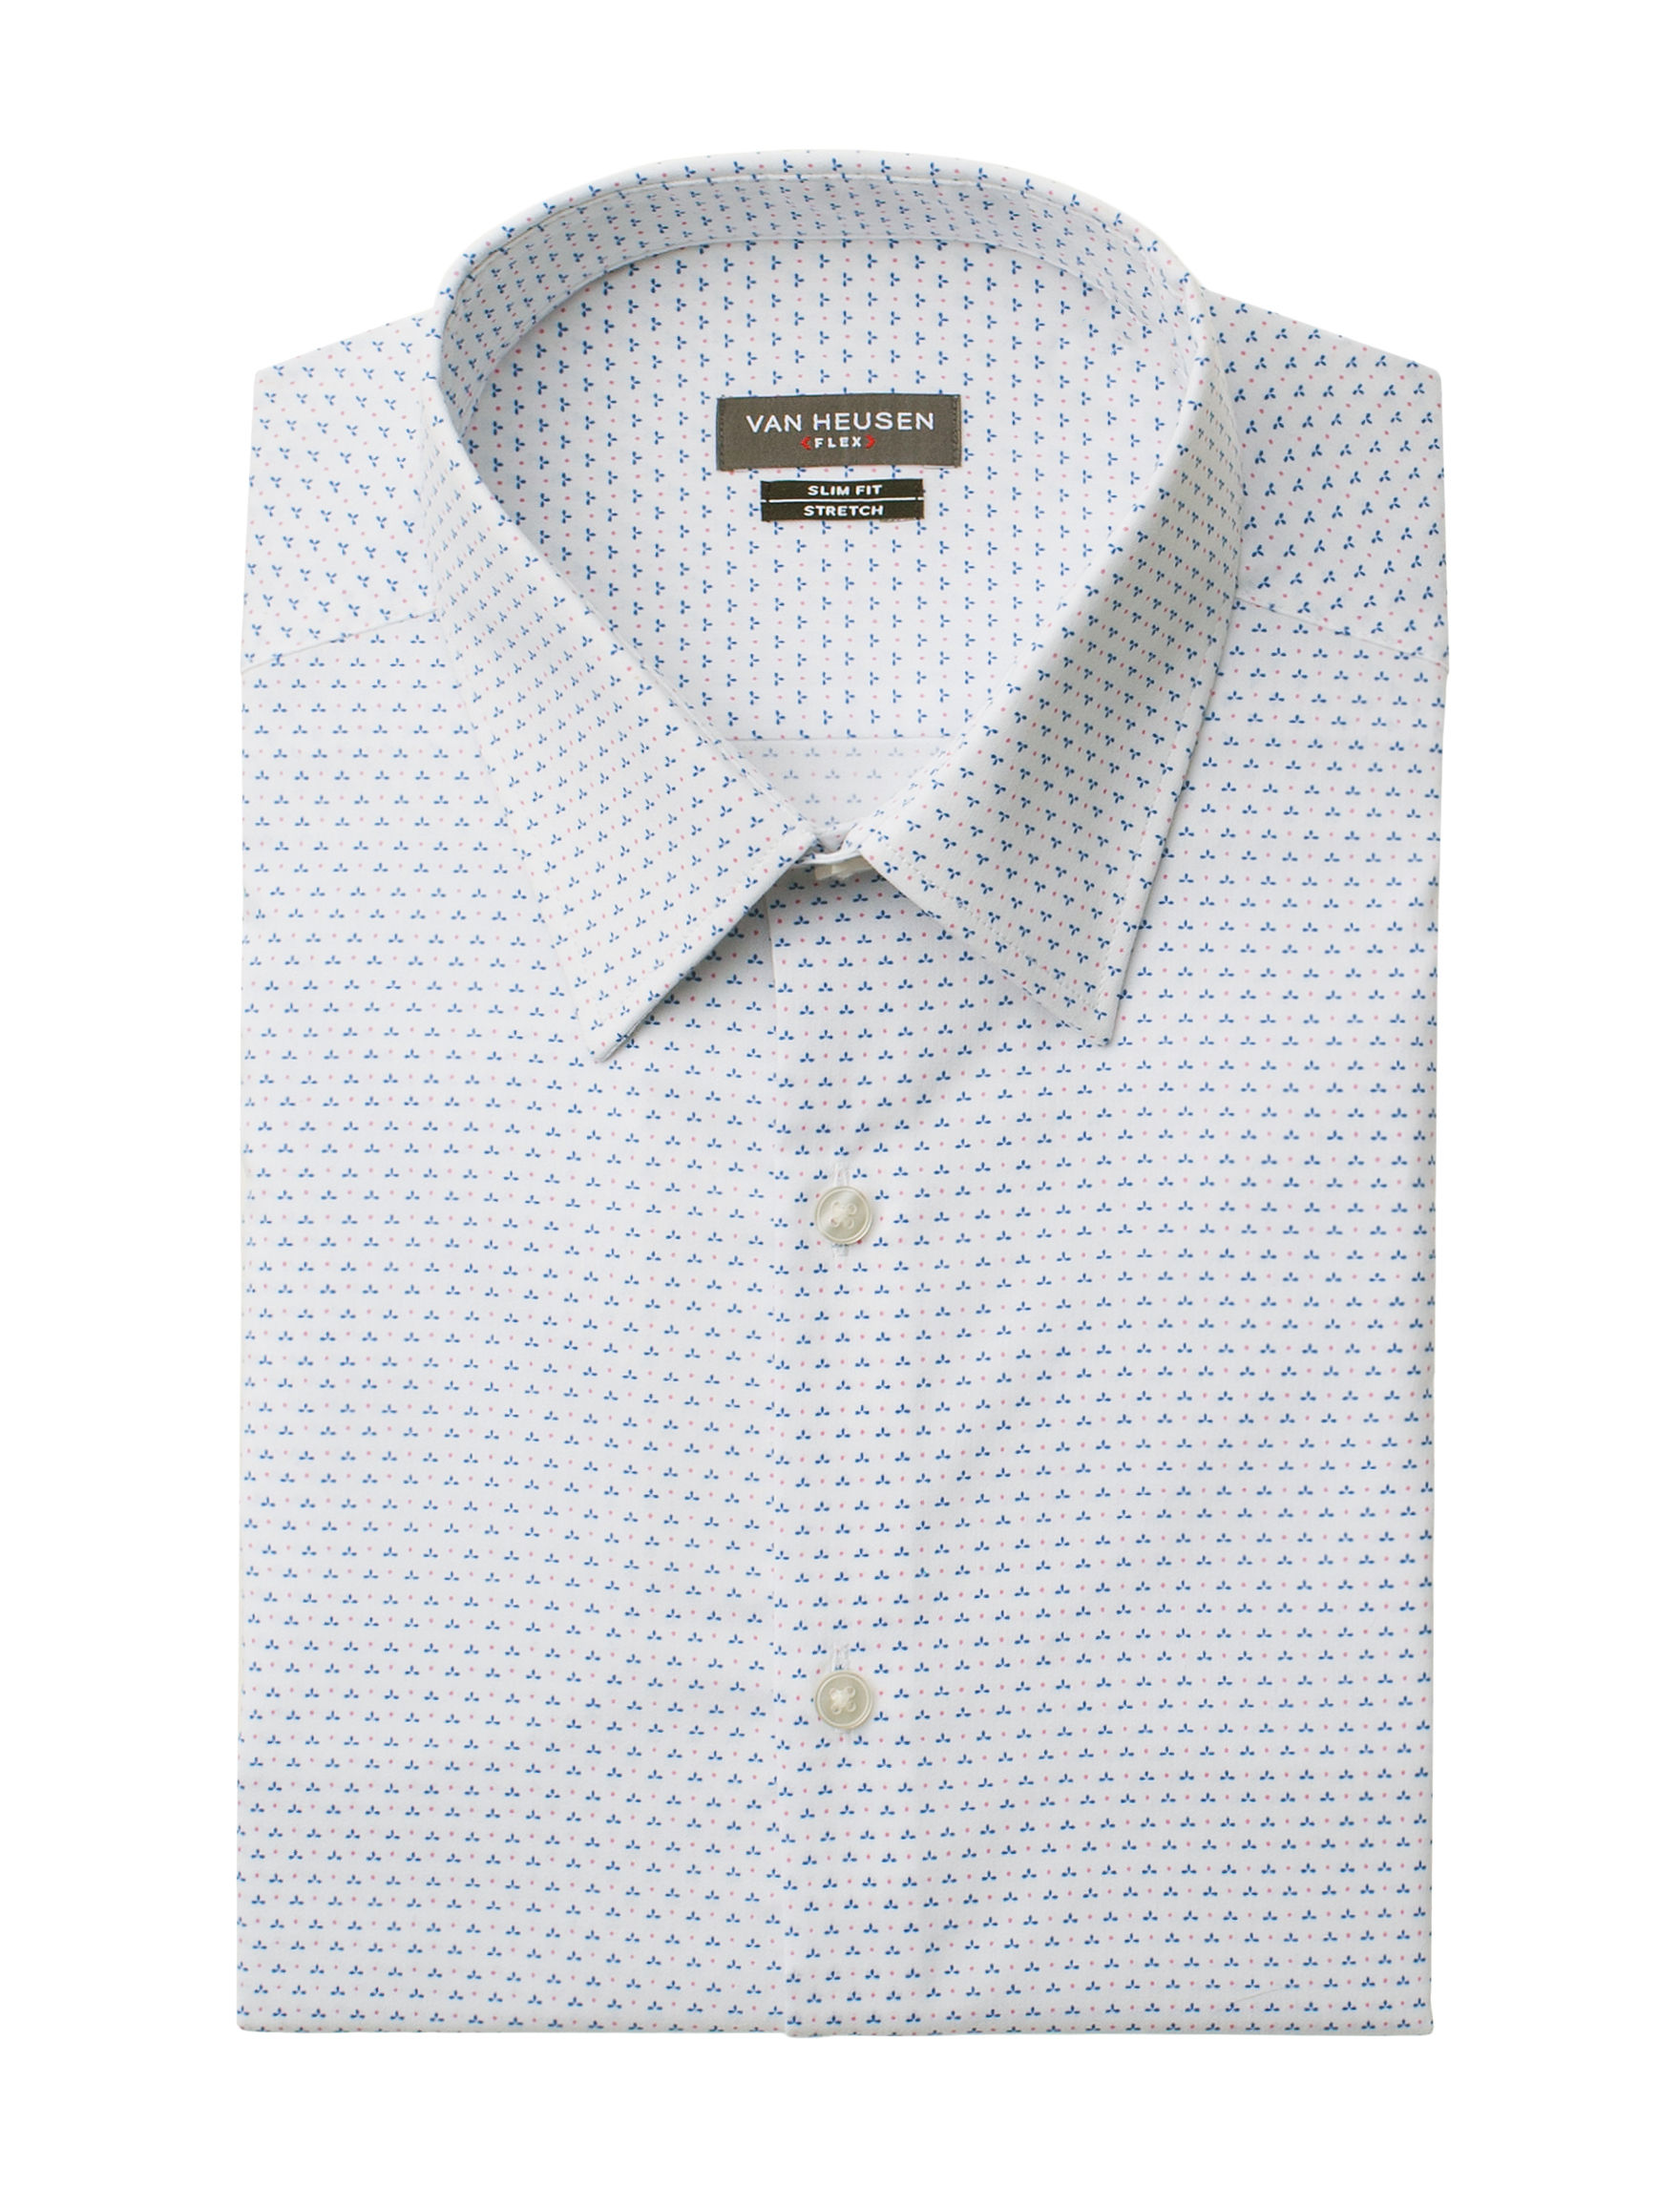 Van Heusen White Multi Dress Shirts